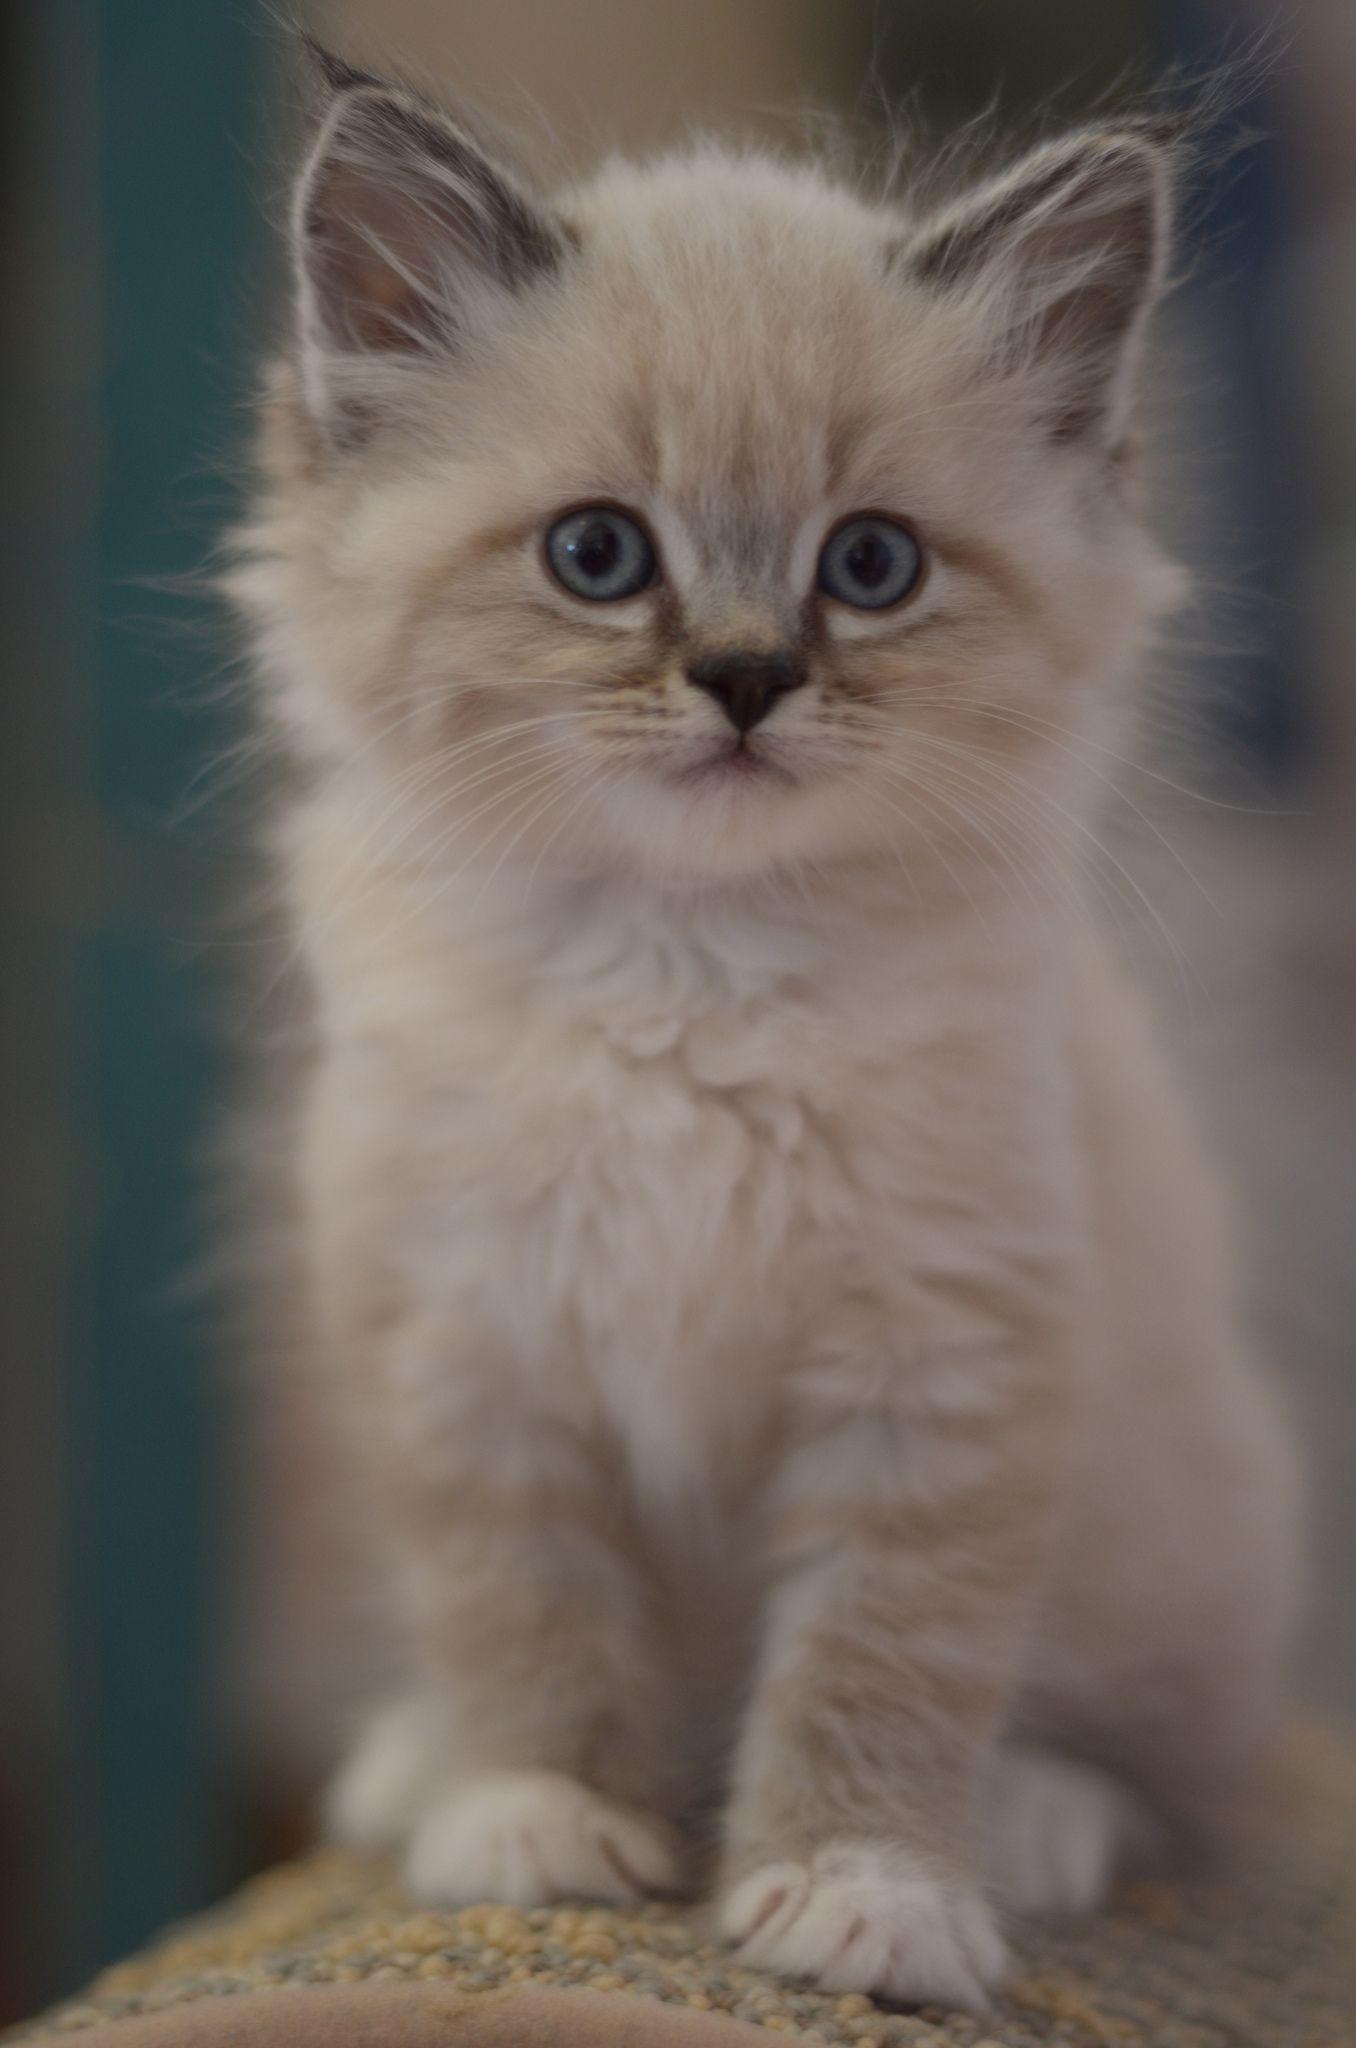 DSC_0061 Kittens cutest, Cute cats, Cute fluffy kittens